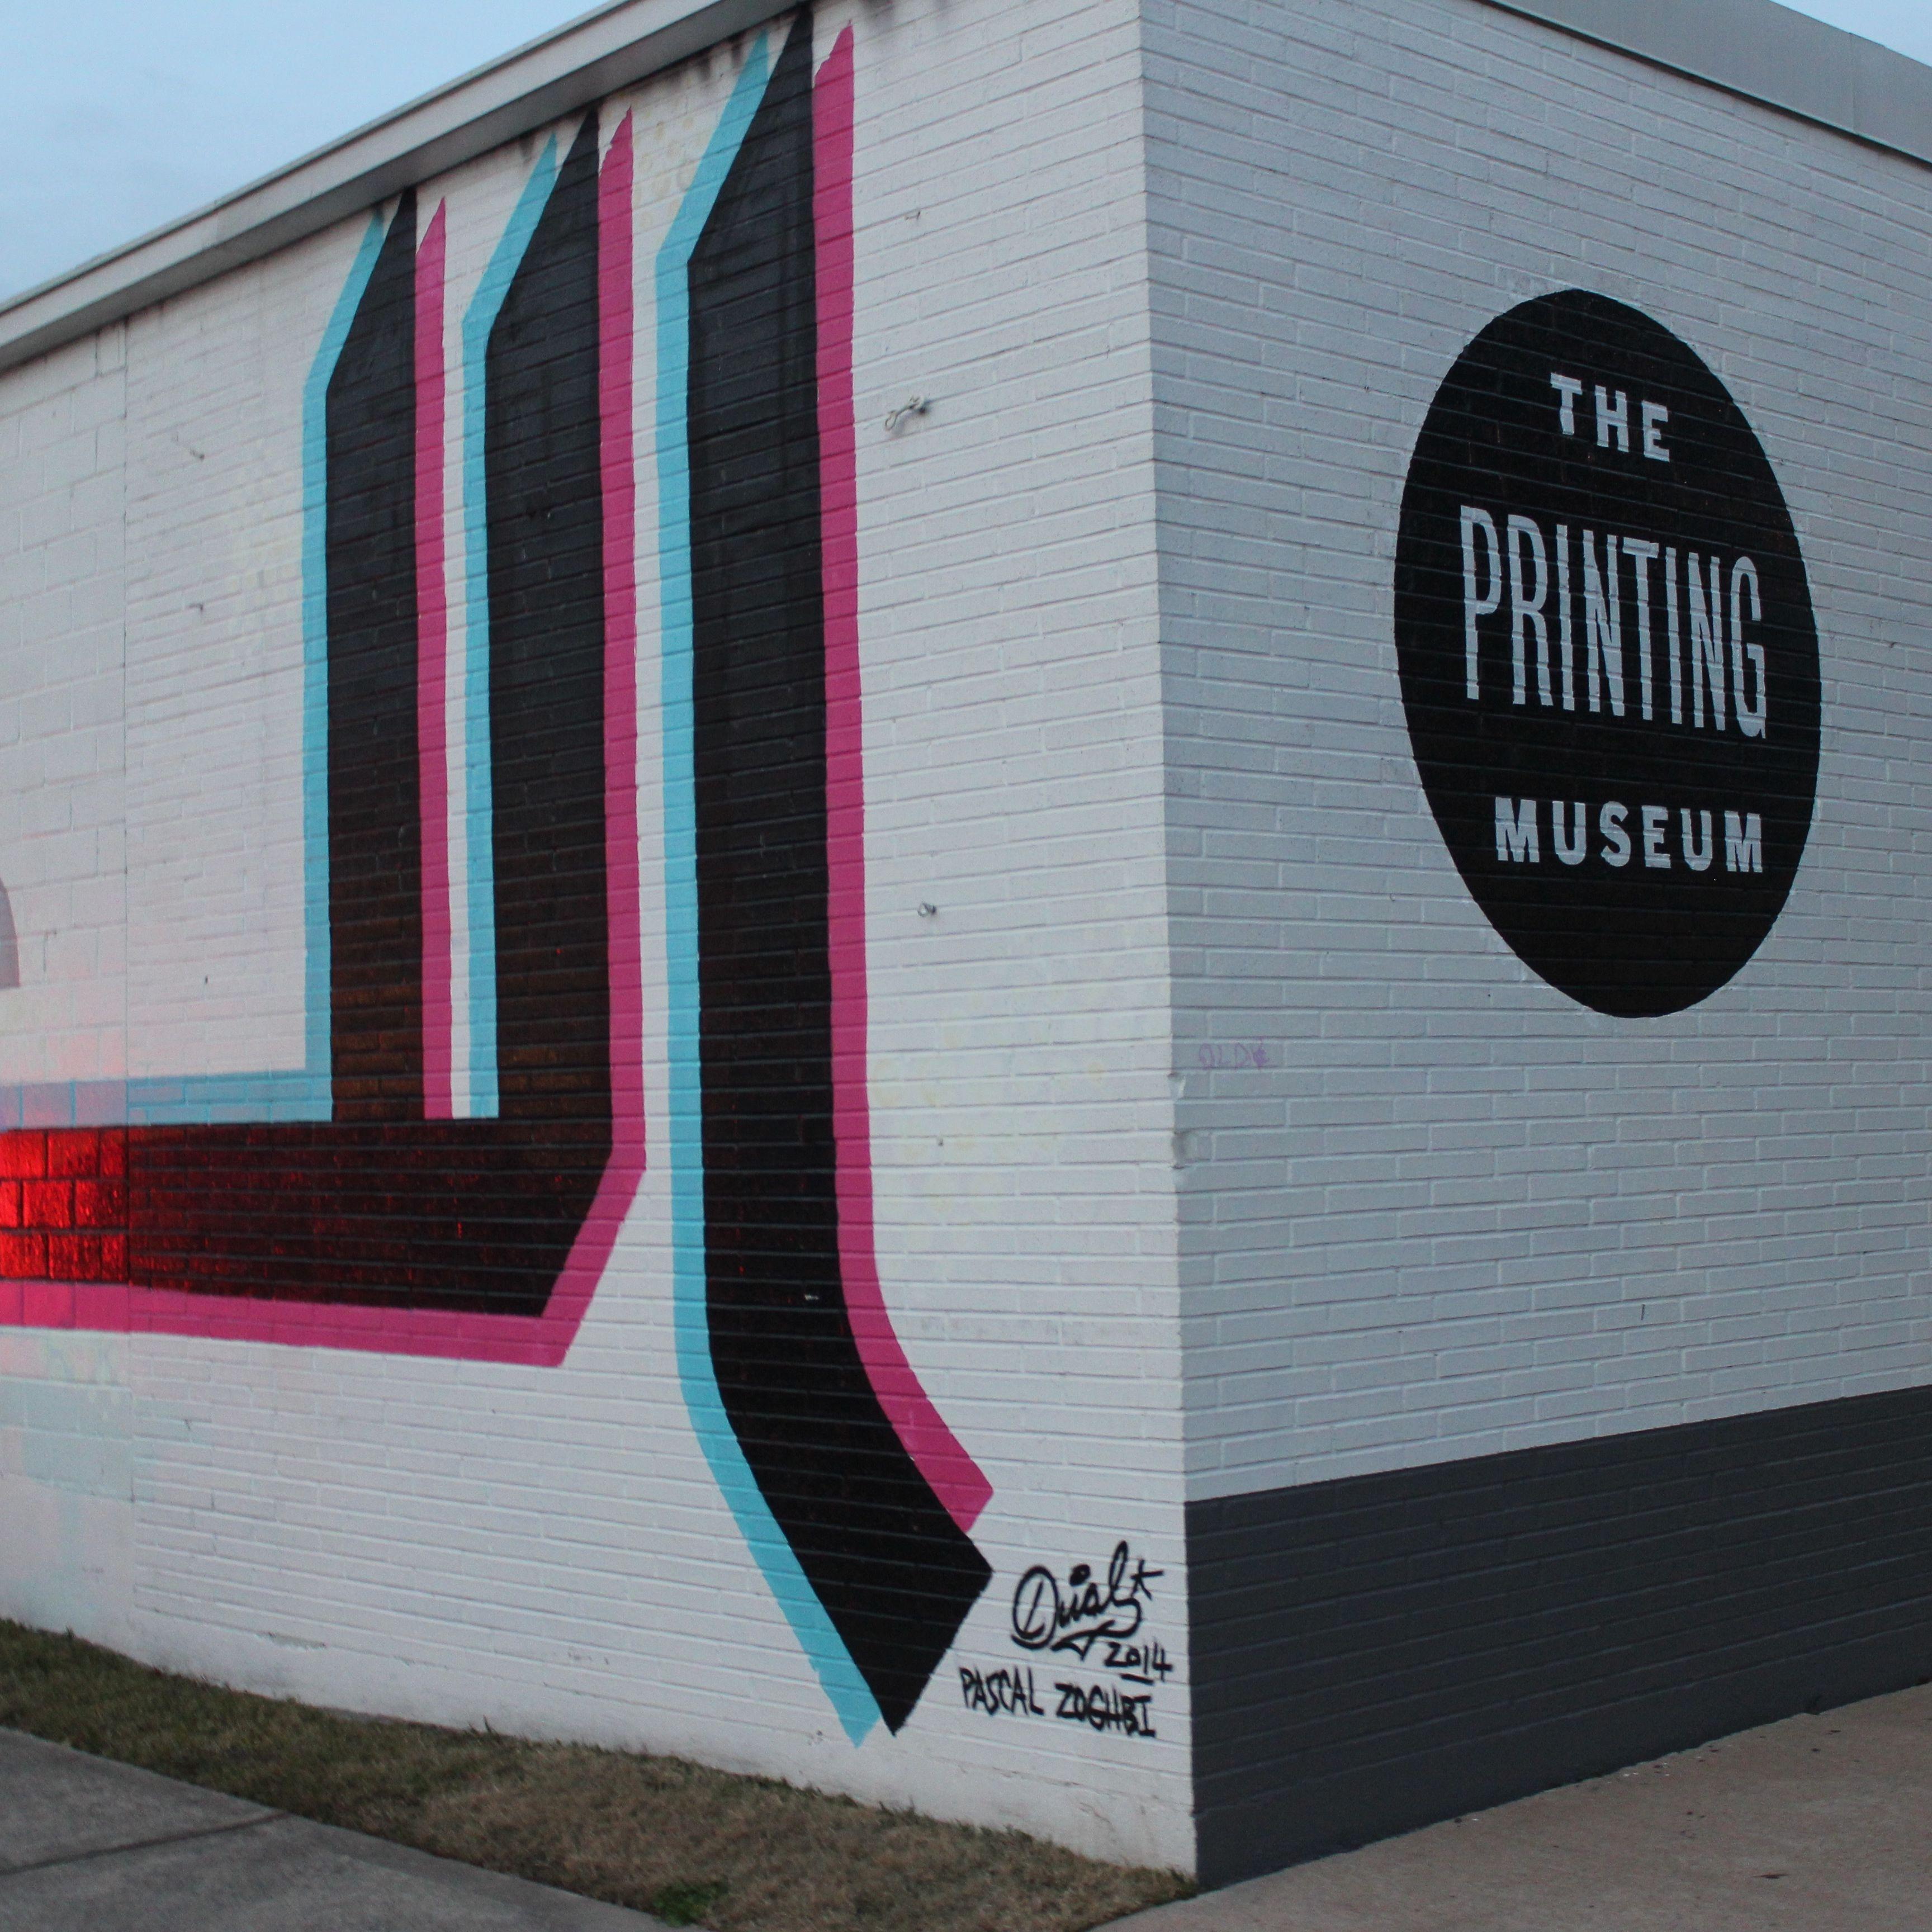 Printing museum scyzsz